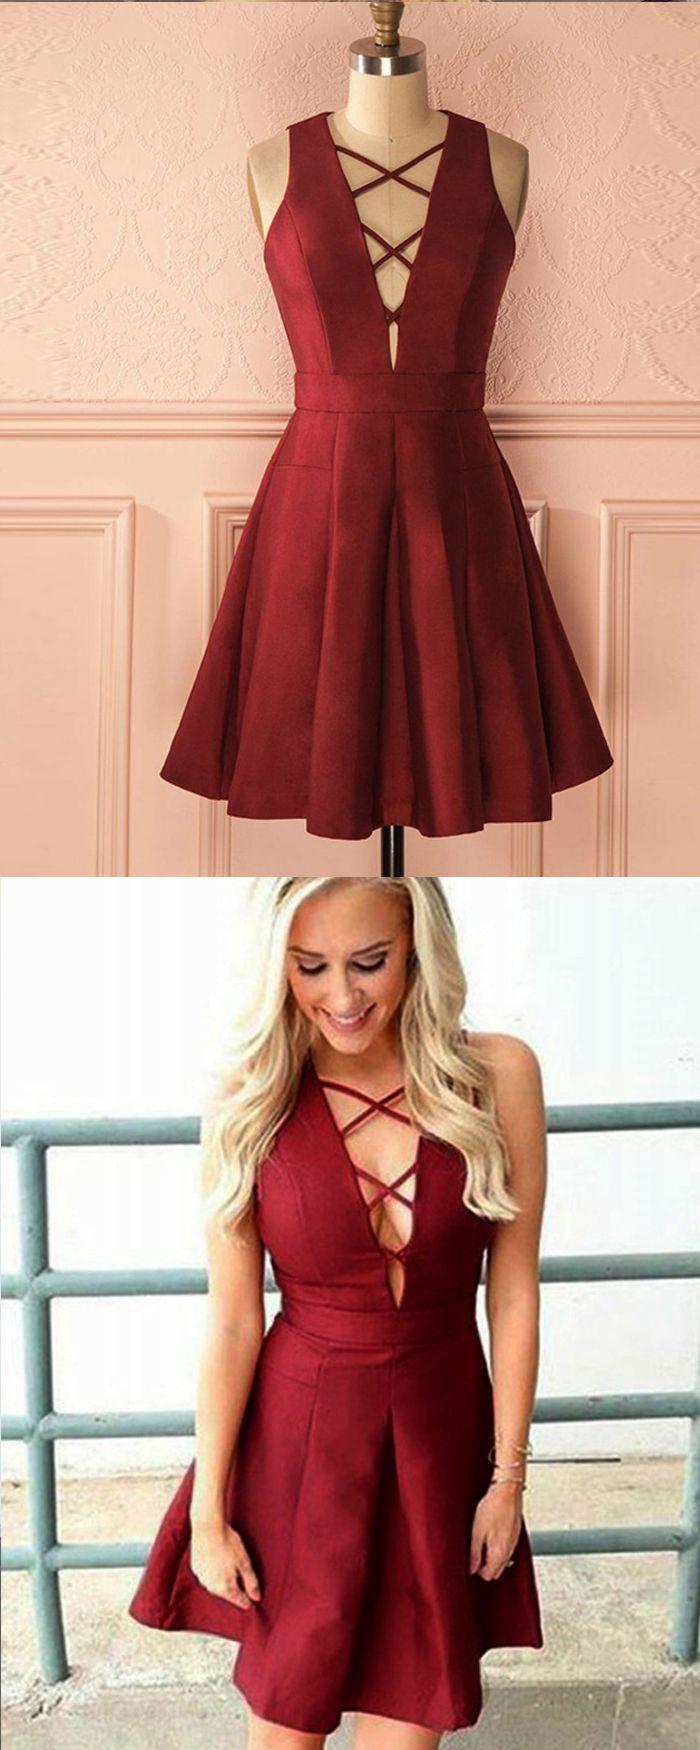 Simple criss cross burgundy satin pleated short homecoming dress